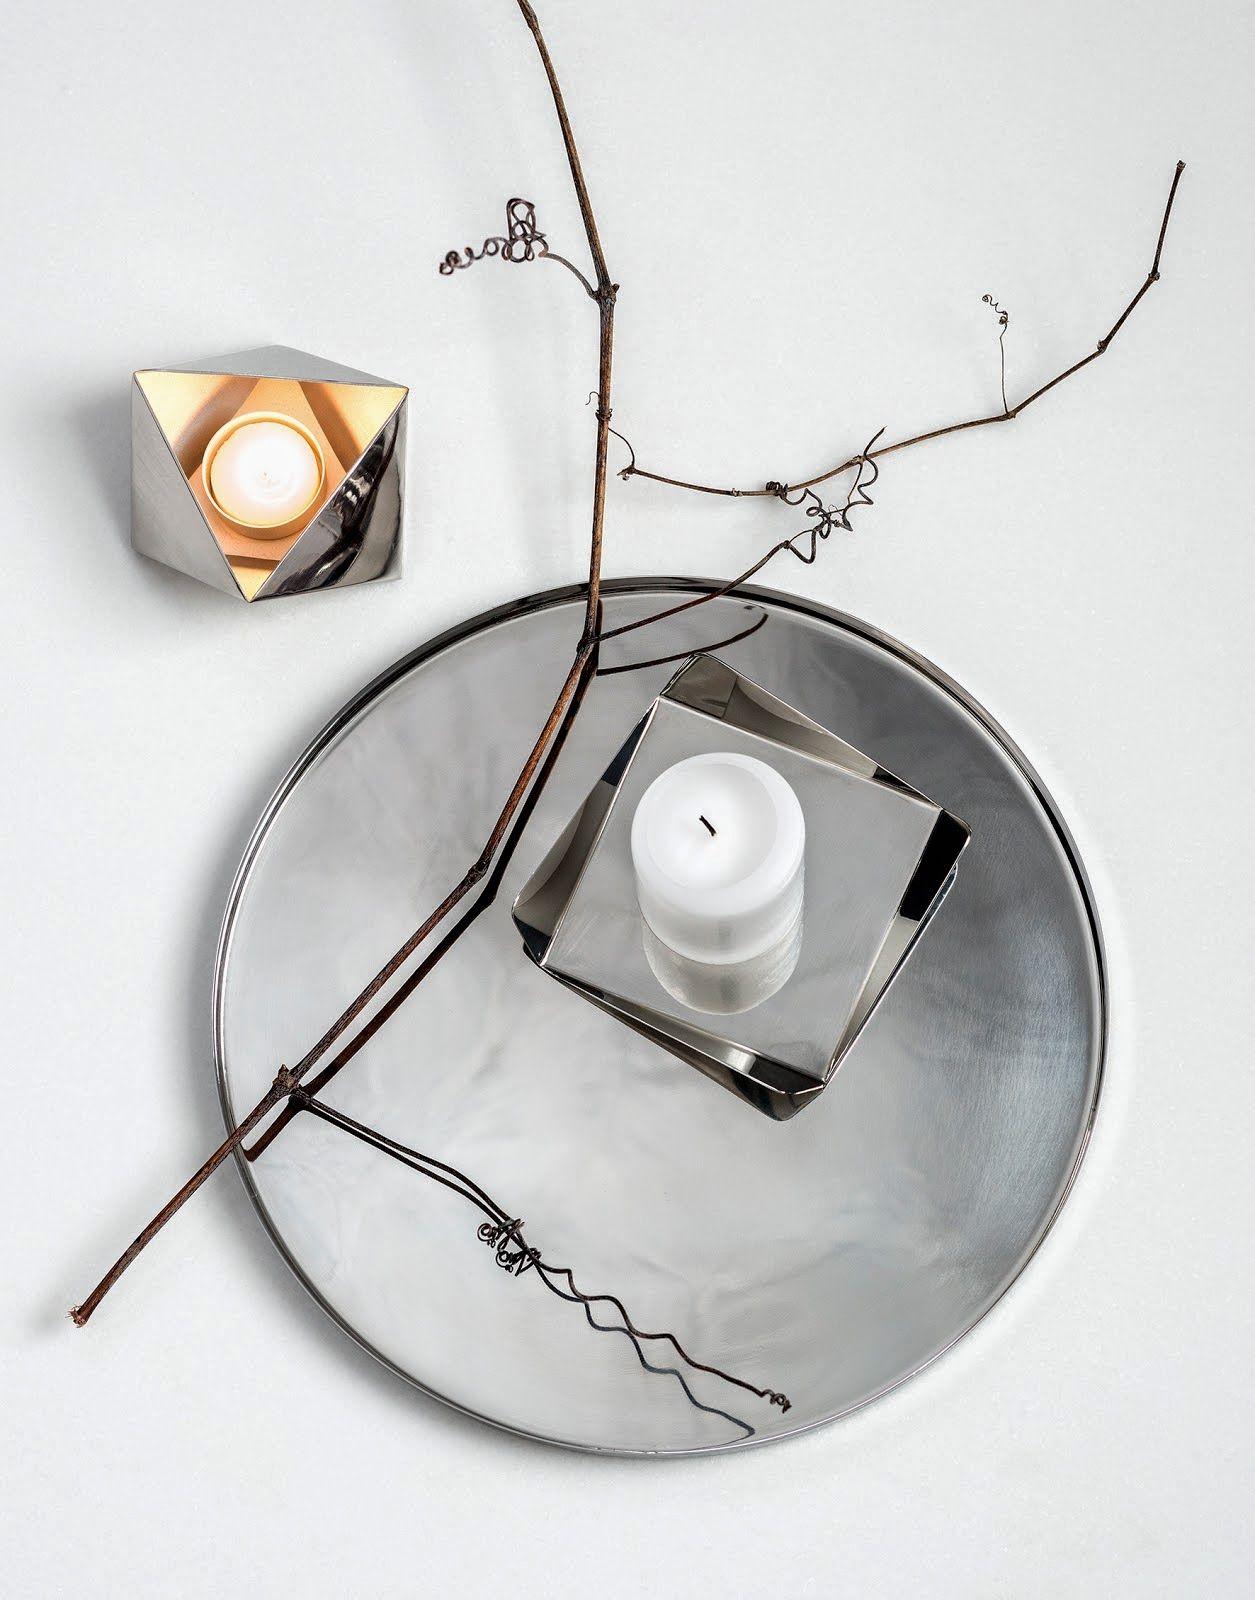 New post on H & M's autumn 2014 home line! www.industrialsandinteriors.blogspot.ca